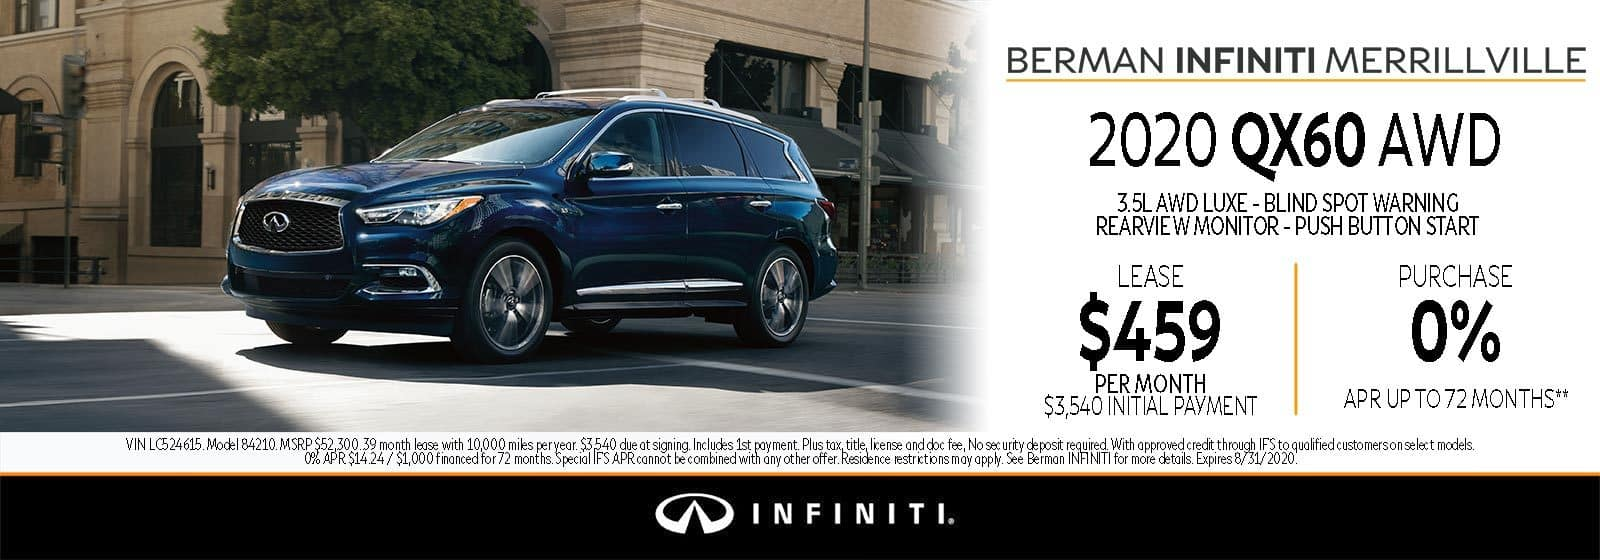 New 2020 INFINITI QX60 August Offer at Berman INFINITI of Merrillville!